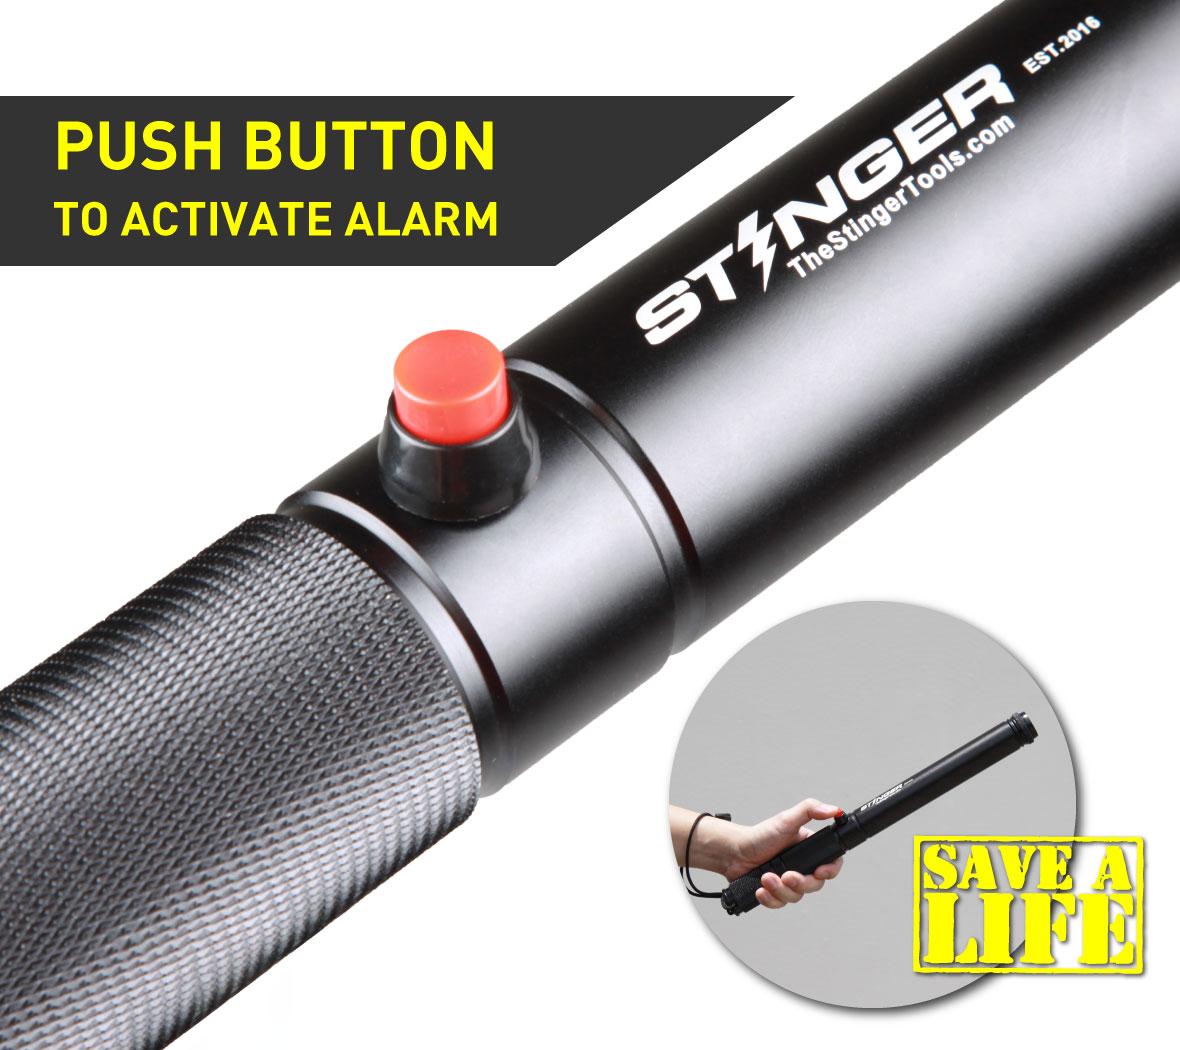 Stinger Loud Personal Alarm Emergency Tool, Safety Alarm, Glass Breaker, Original Design in USA